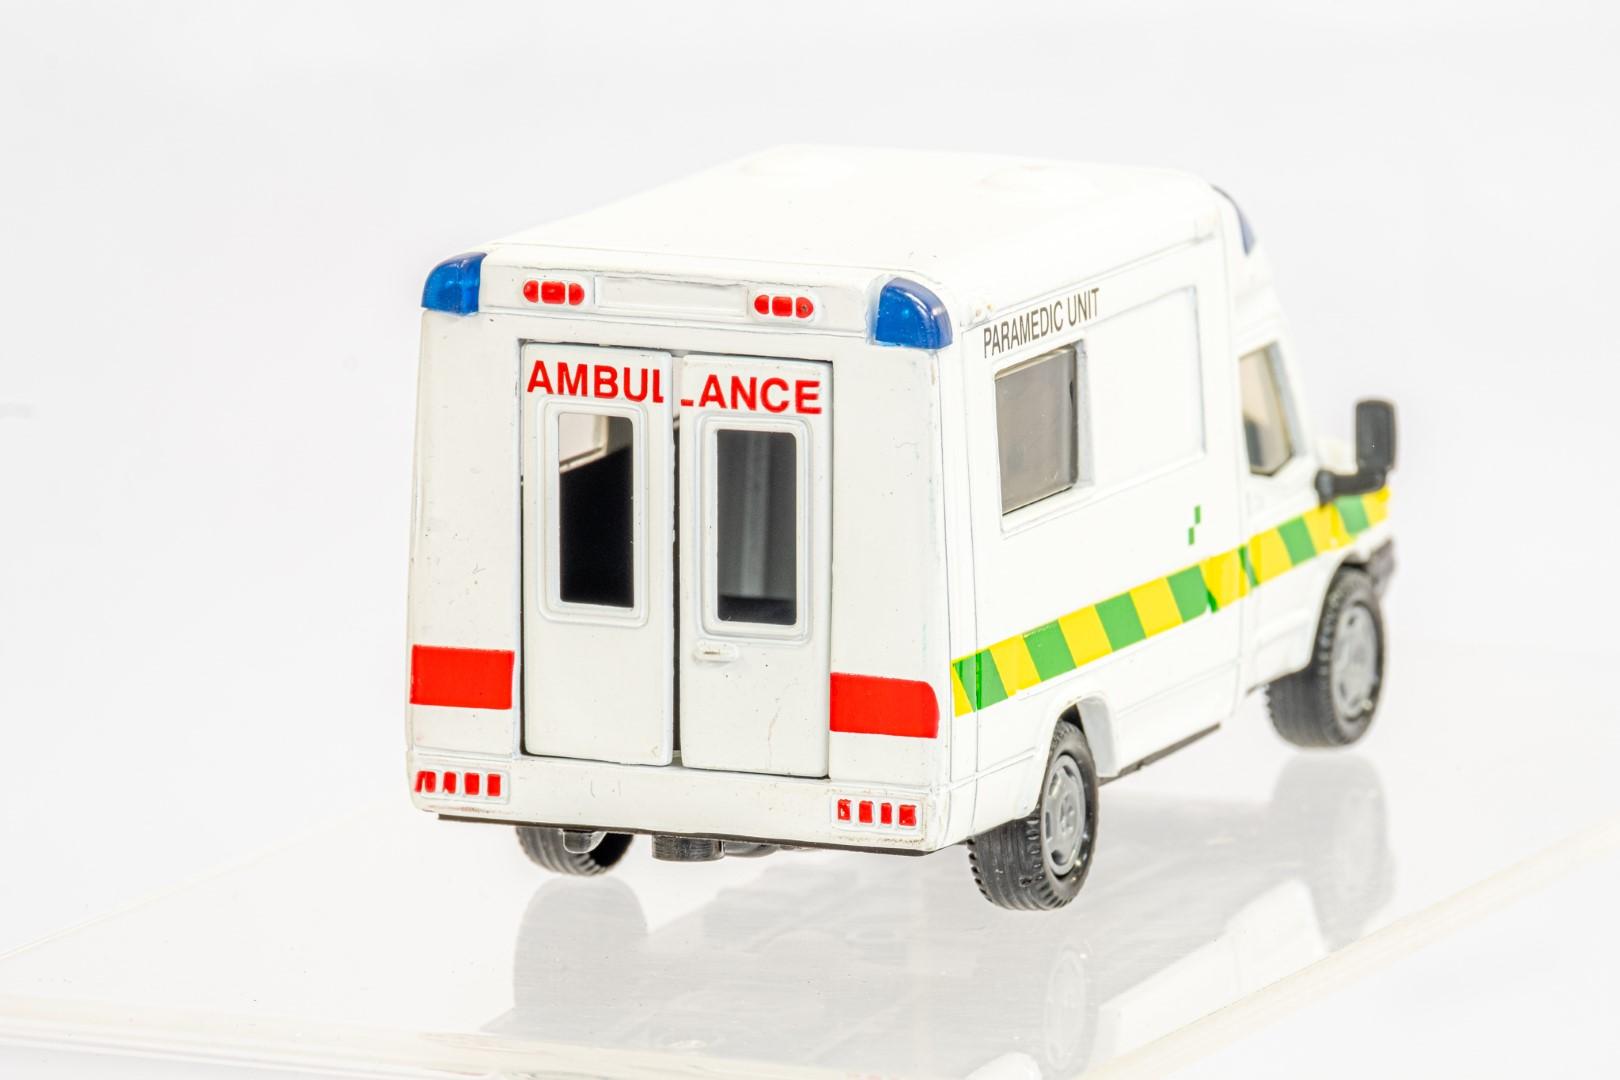 4 x Assorted Ambulance - Image 3 of 9